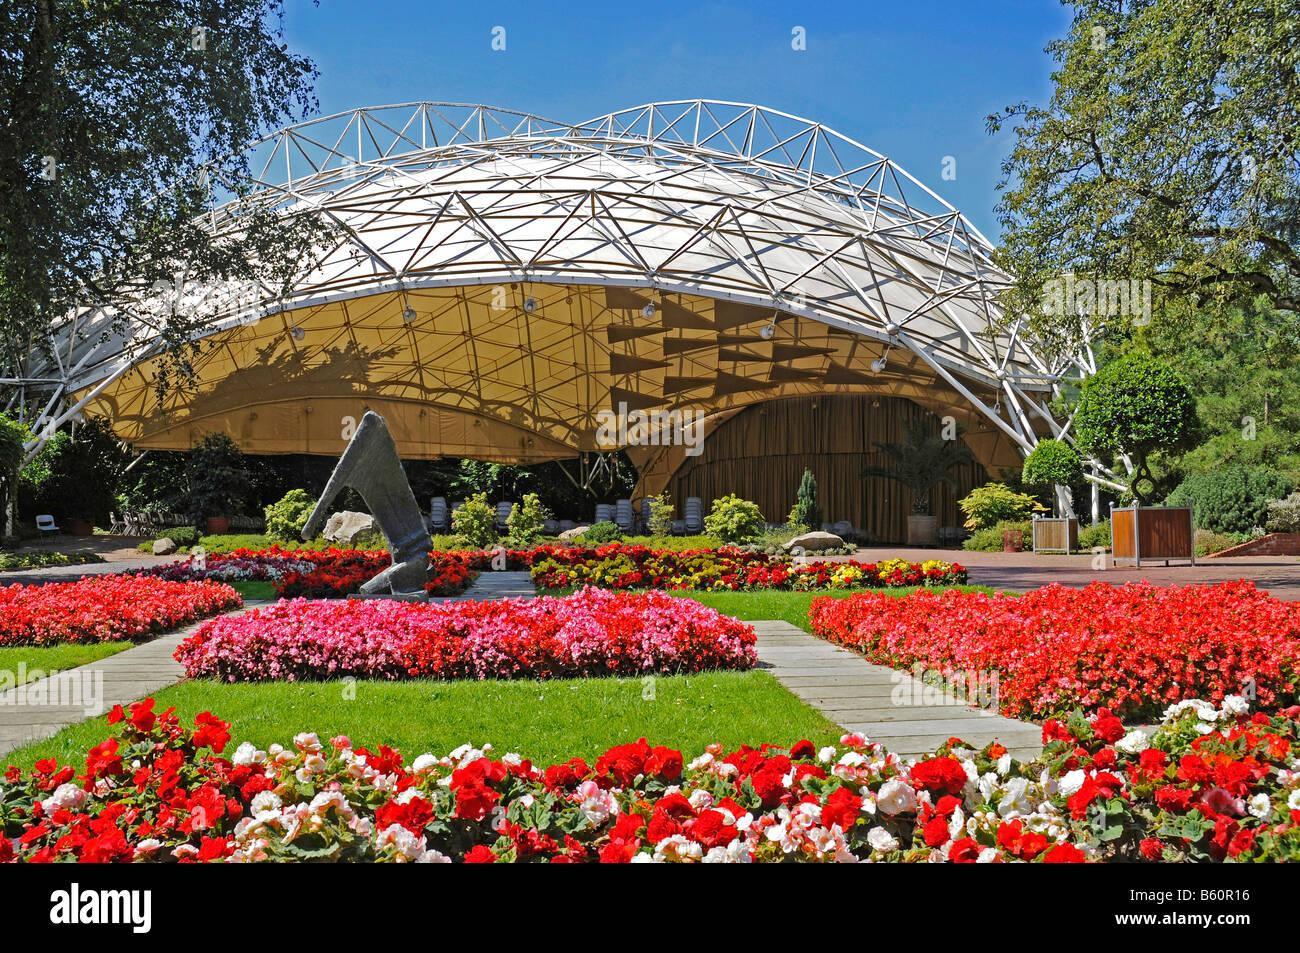 Music pavilion, stage, park, Grugapark, Essen, Ruhrgebiet, Ruhr Area, North Rhine-Westphalia - Stock Image